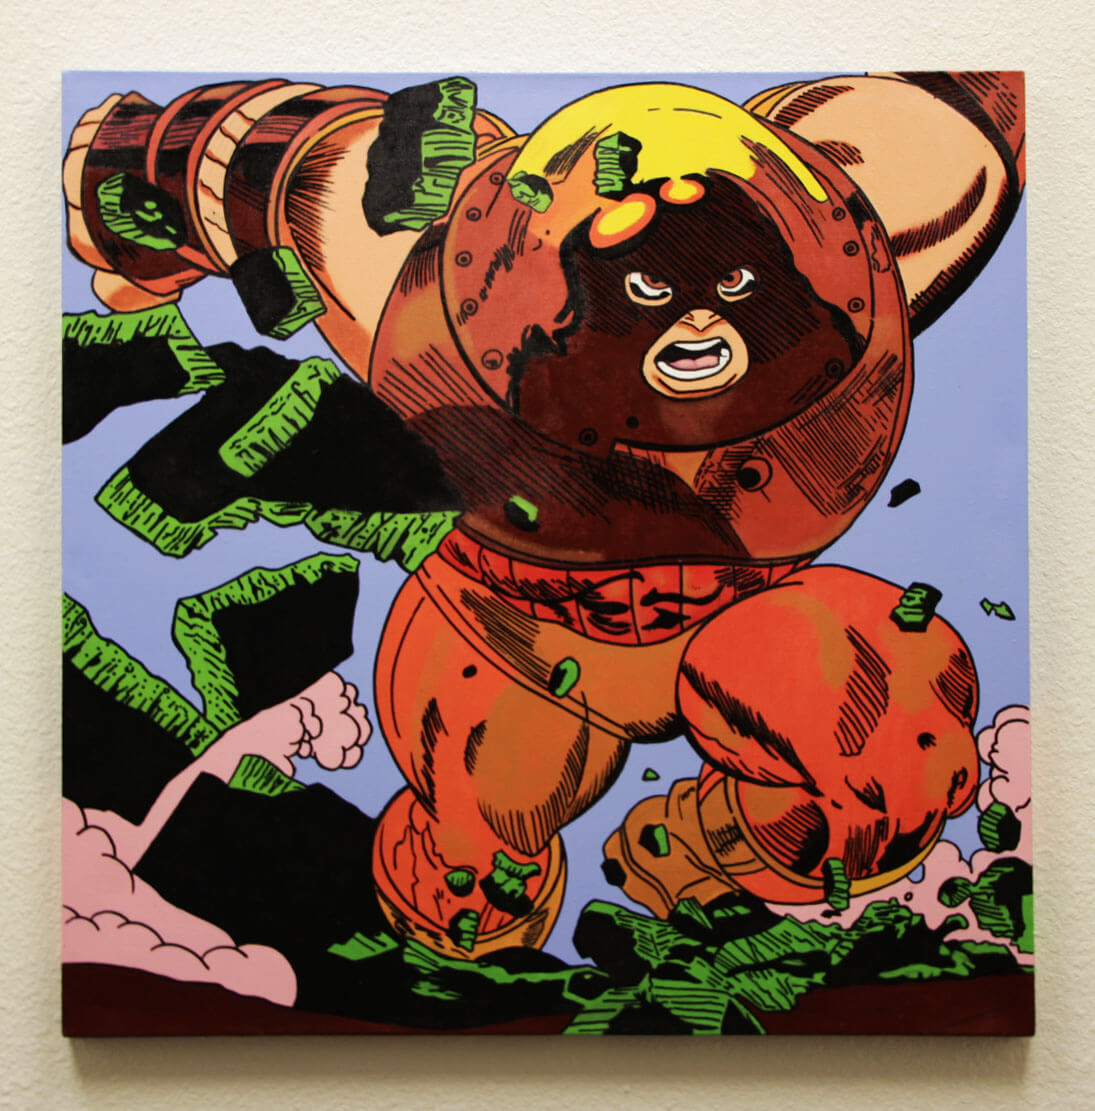 Juggernaut 32x32 Hand Painted Canvas Art Signed by Stan Lee & Steve Kaufman LE 3/10